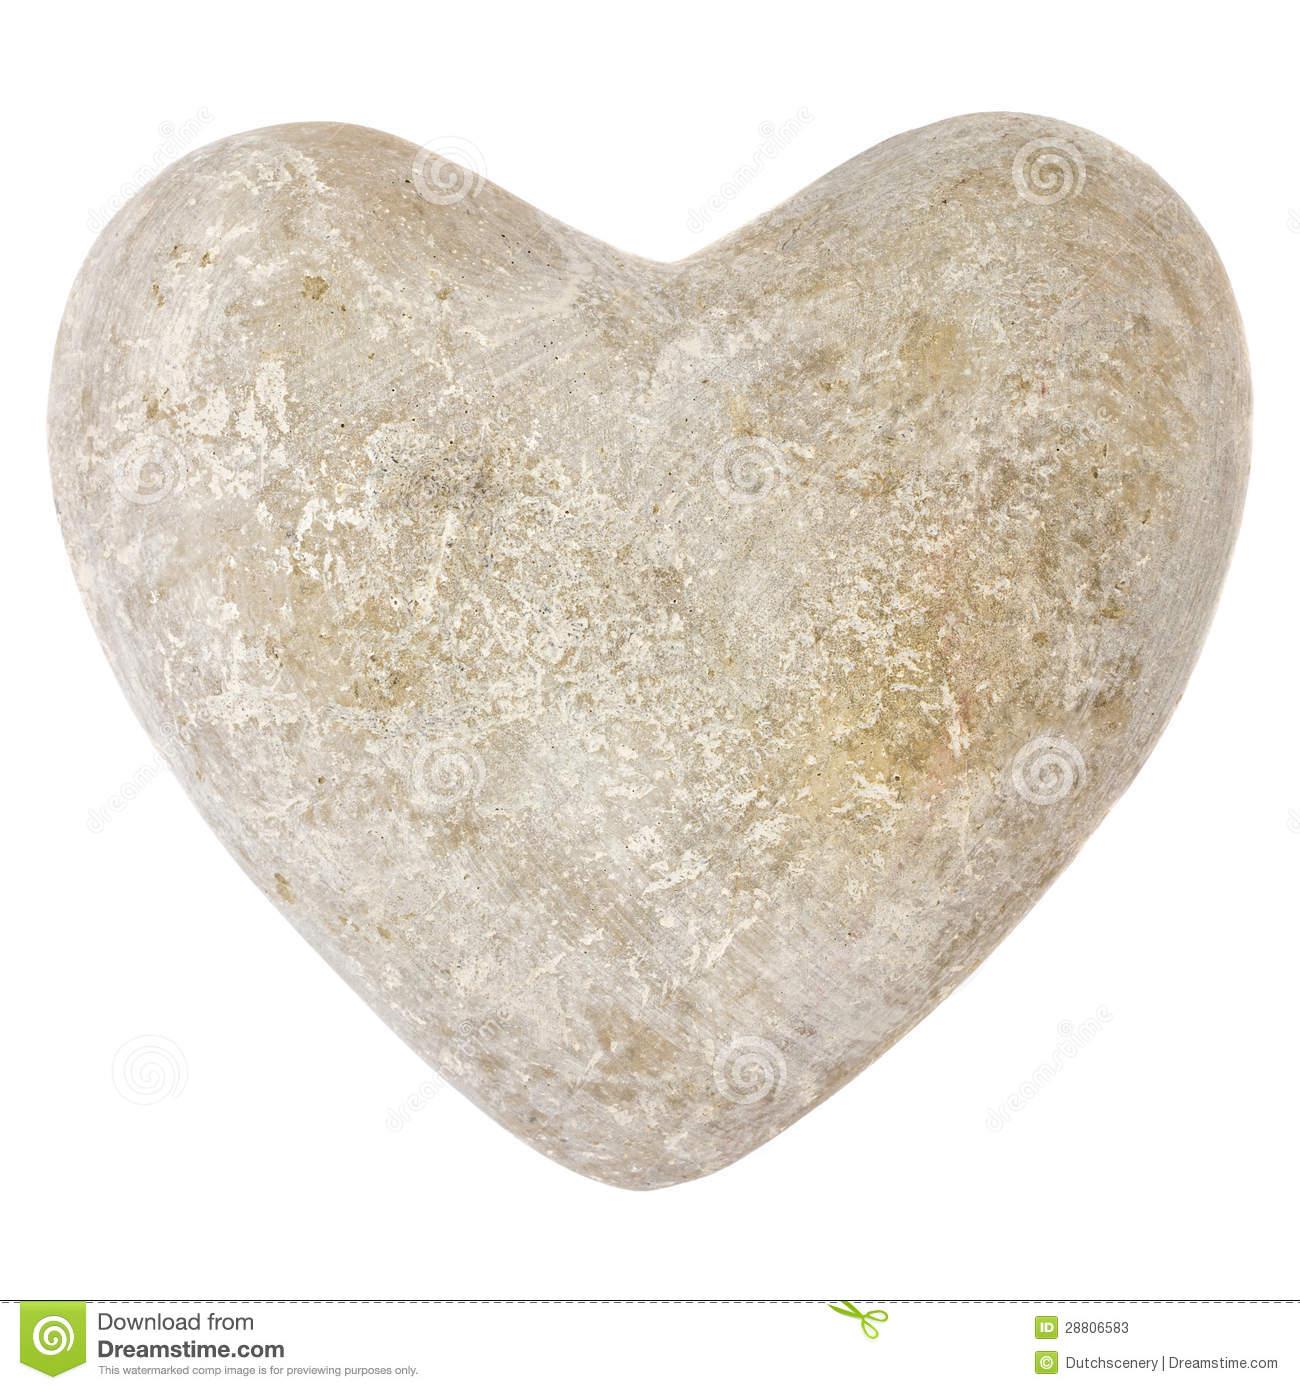 Stone heart clipart.